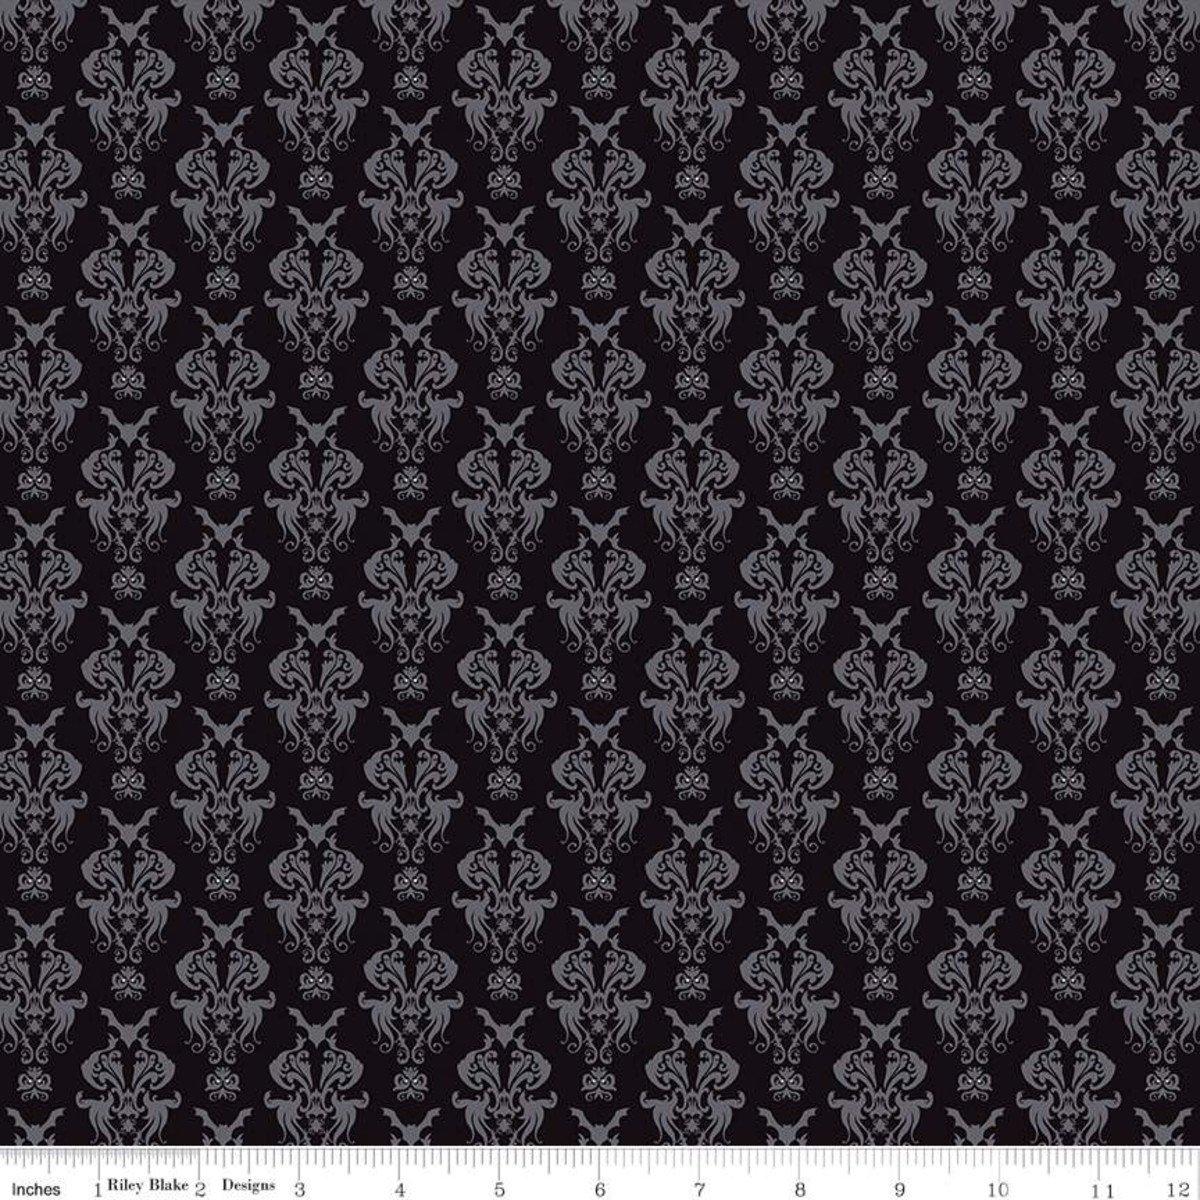 c10571-black Spooky Hollow